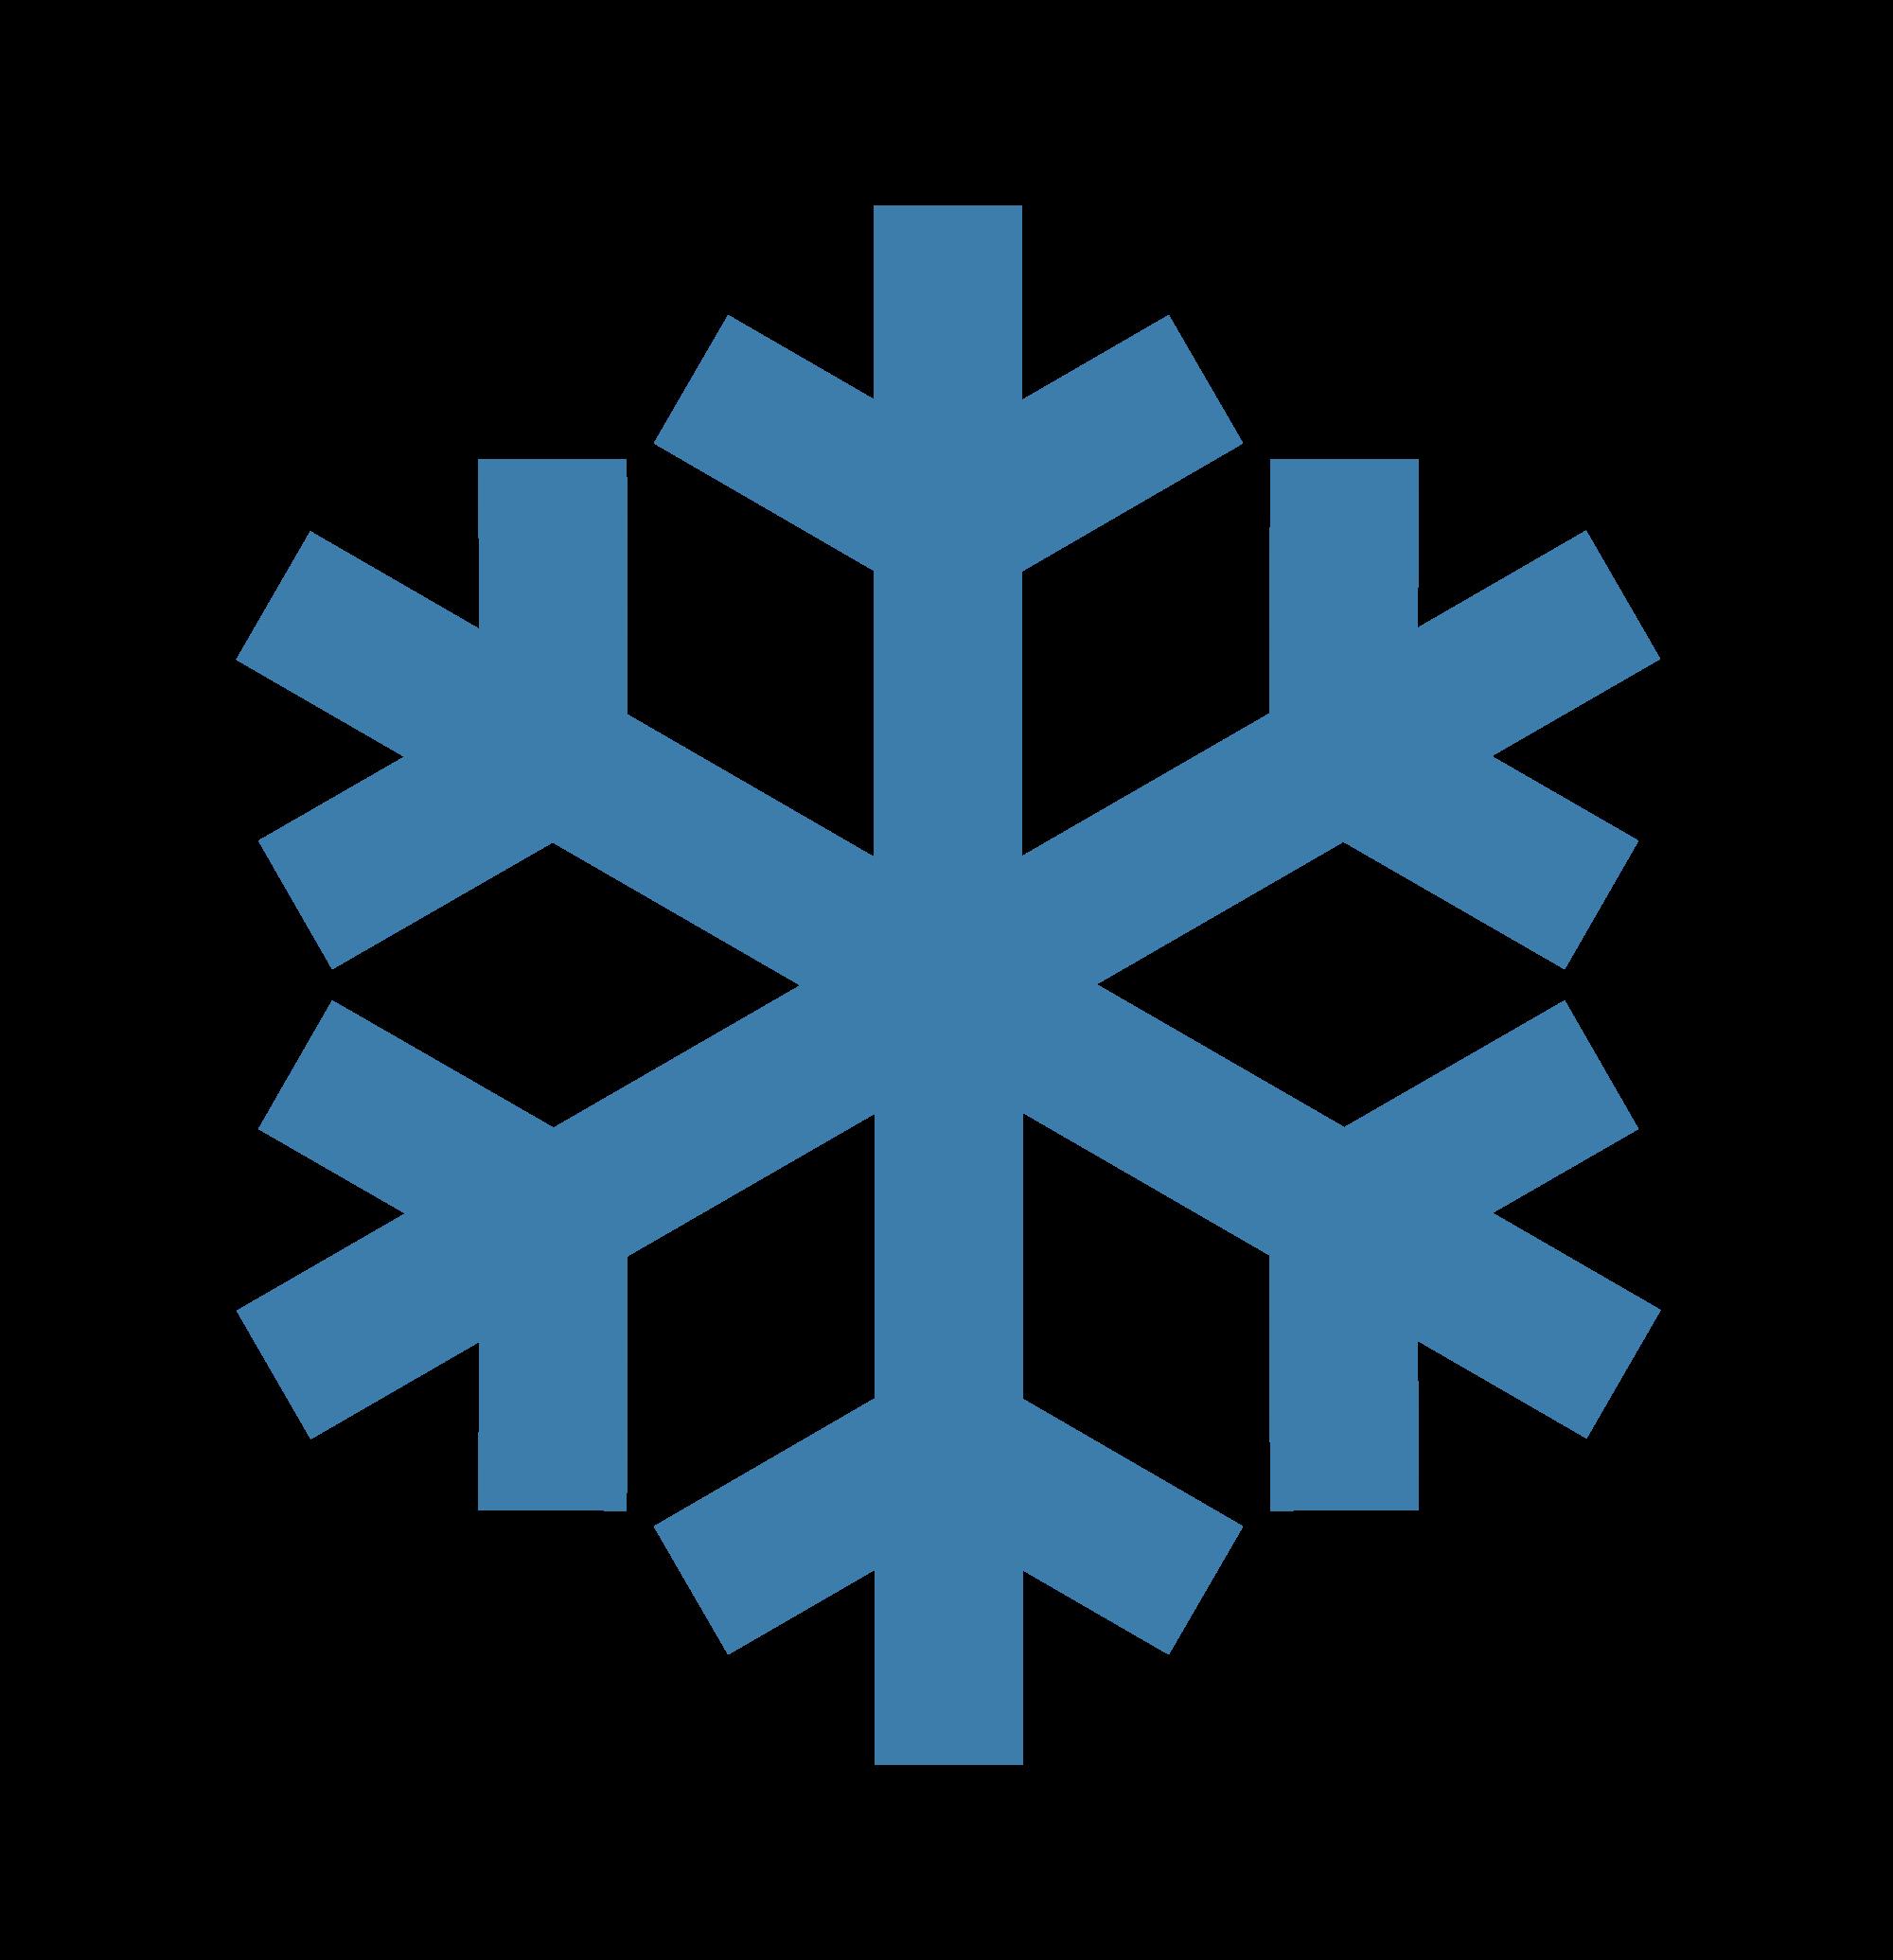 Bullet point acur lunamedia. Clipart snowflake city